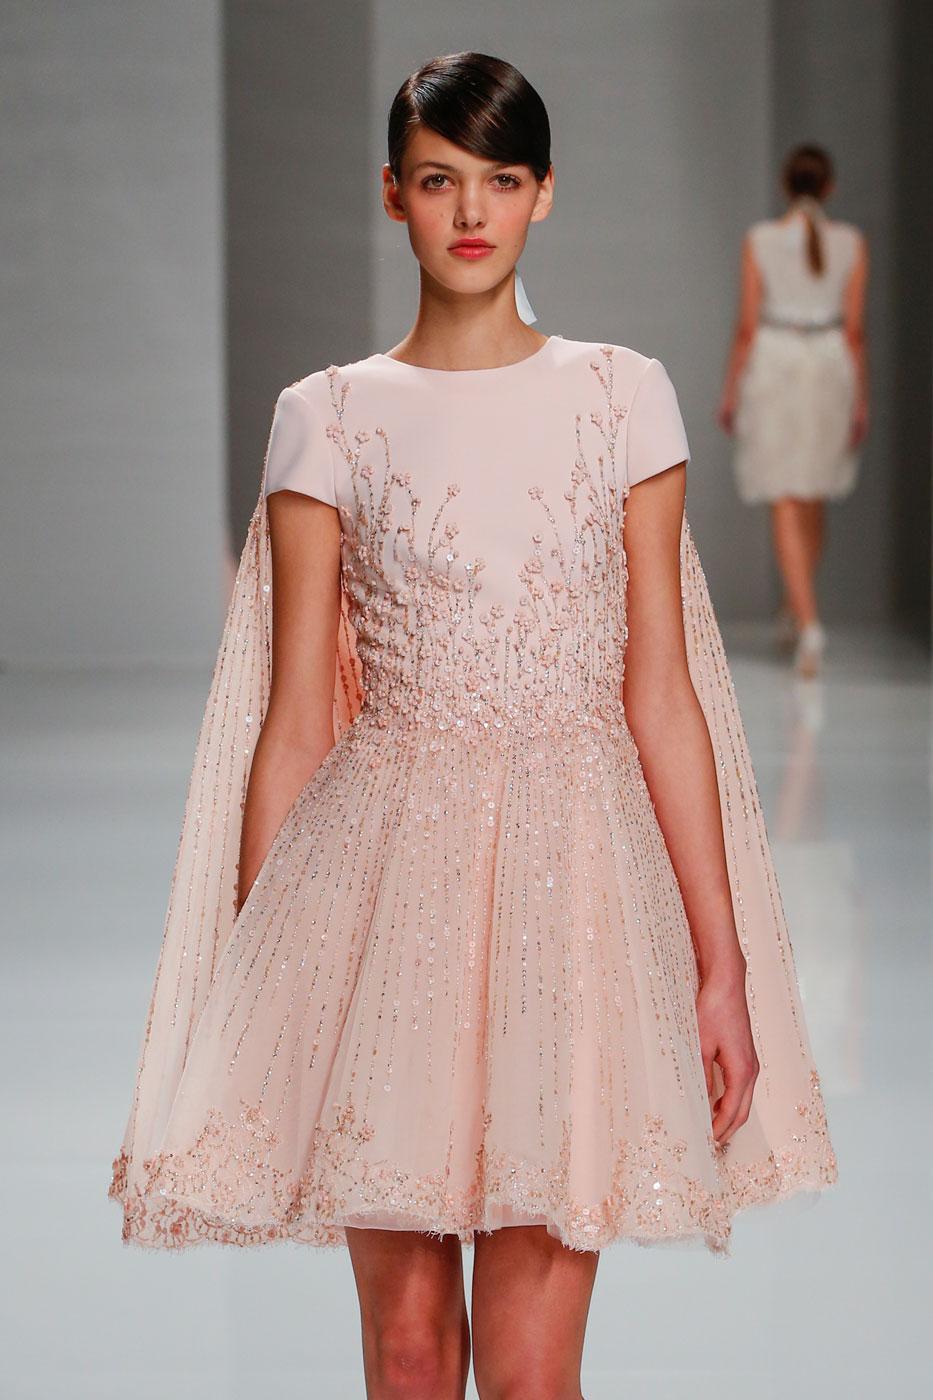 Georges-Hobeika-fashion-runway-show-haute-couture-paris-spring-2015-the-impression-70